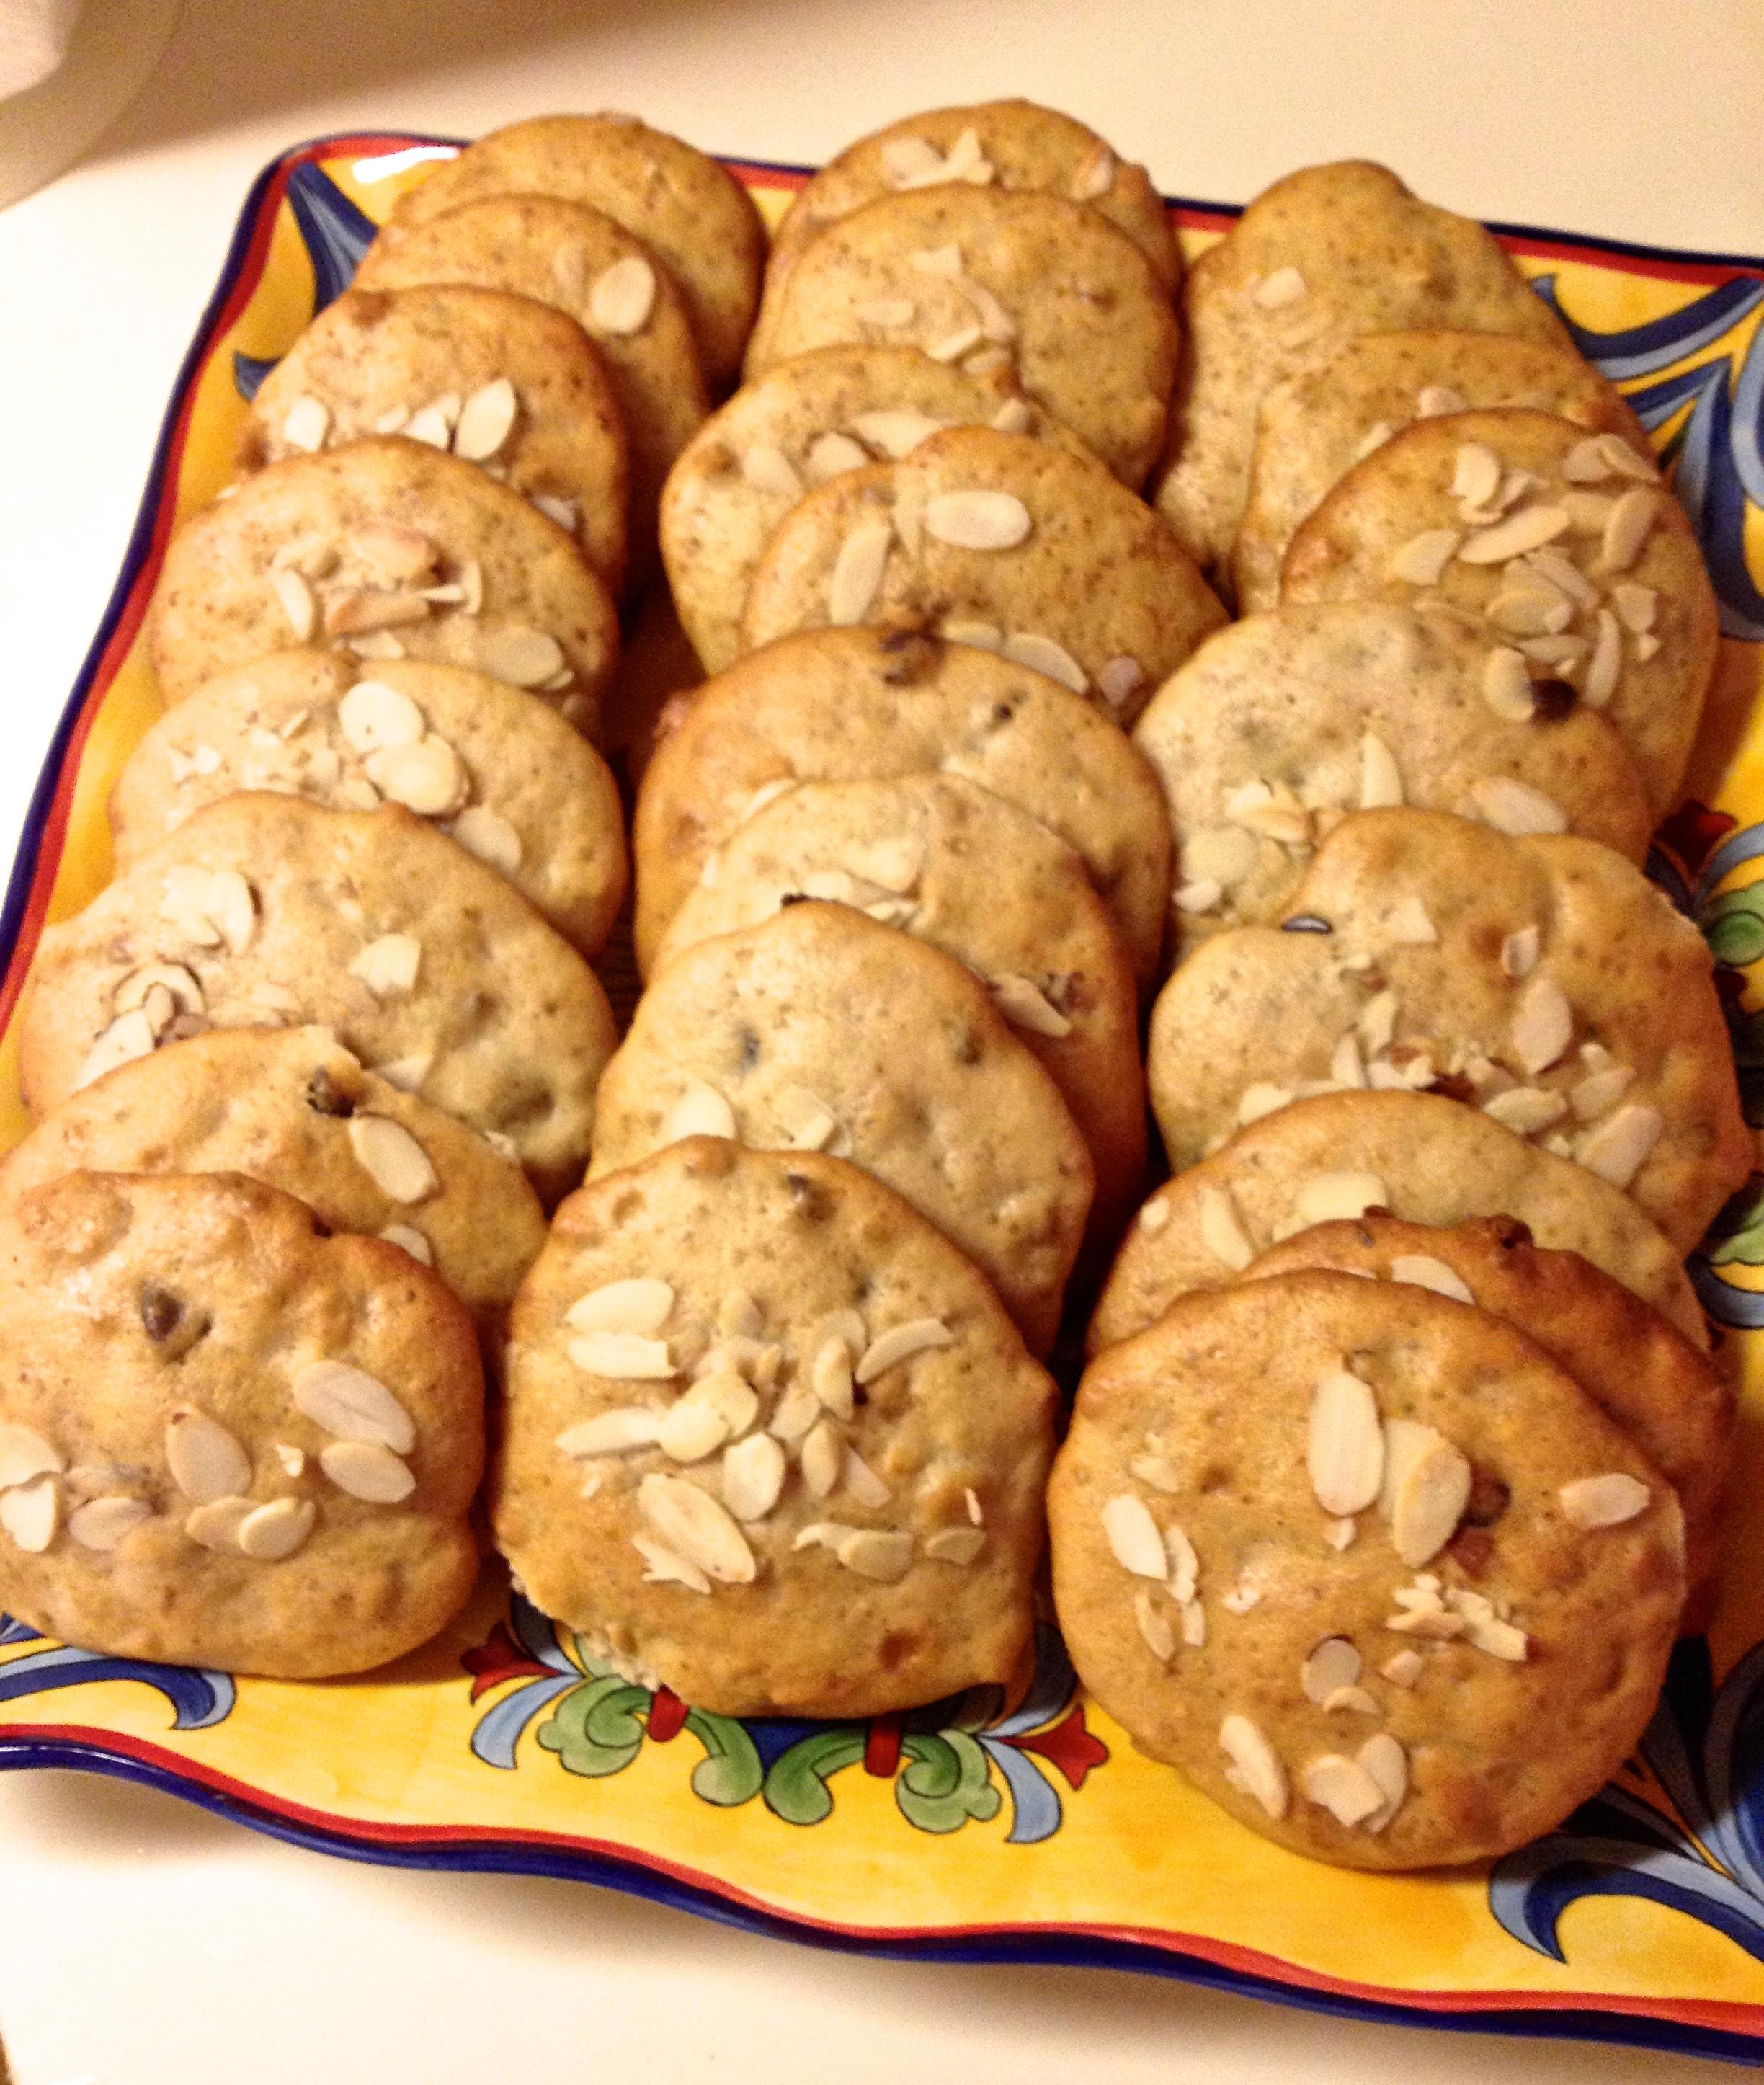 Banana Walnuts Chocolate Chip Soft Cookies